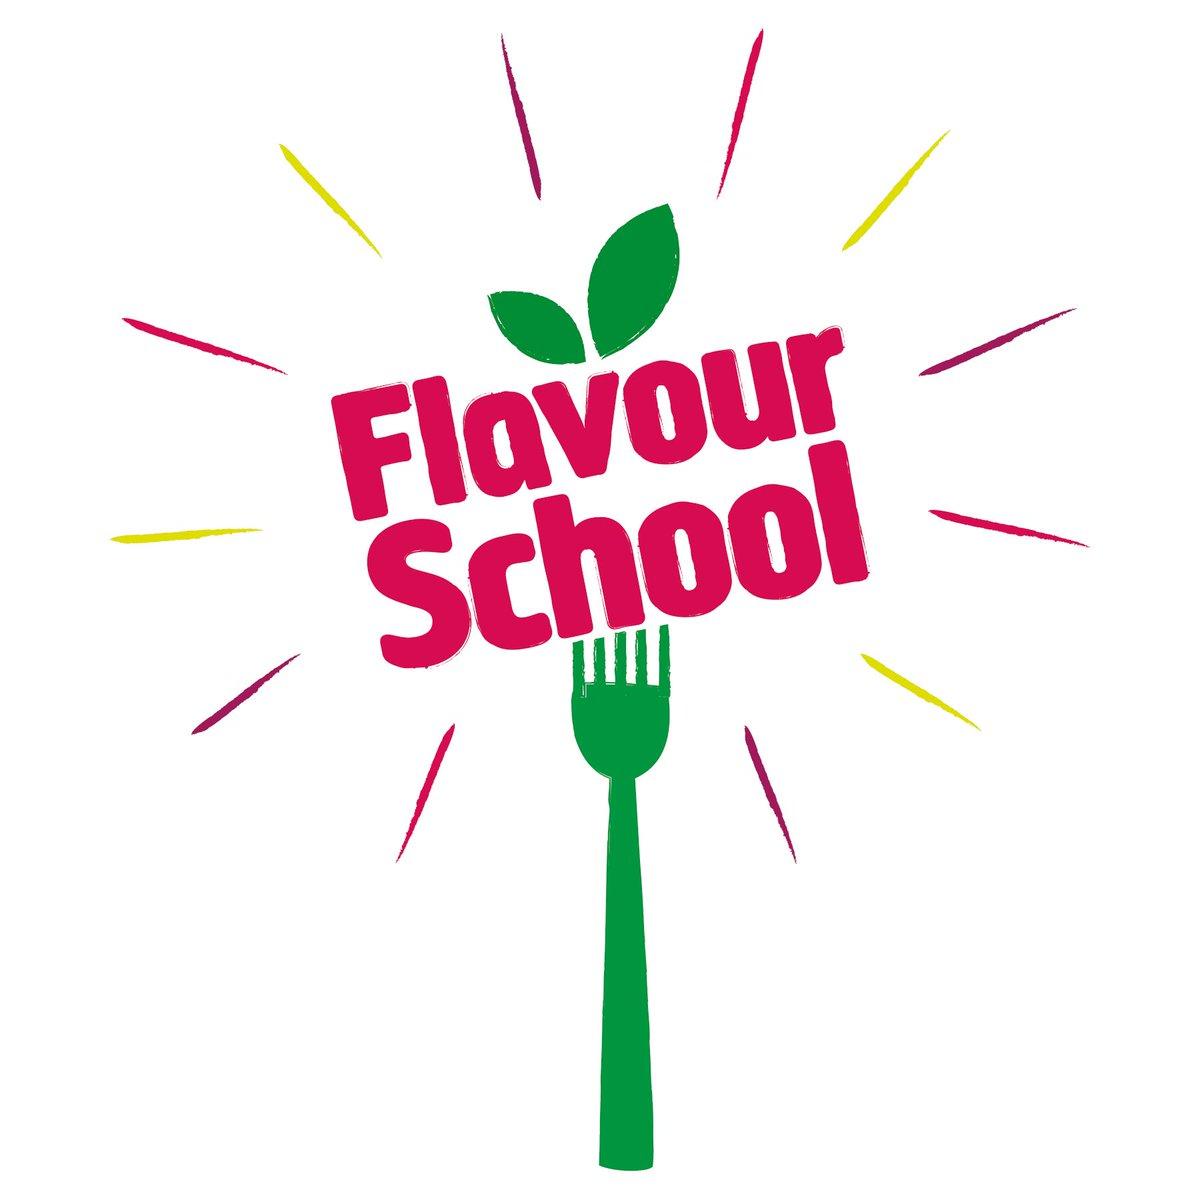 Flavour School